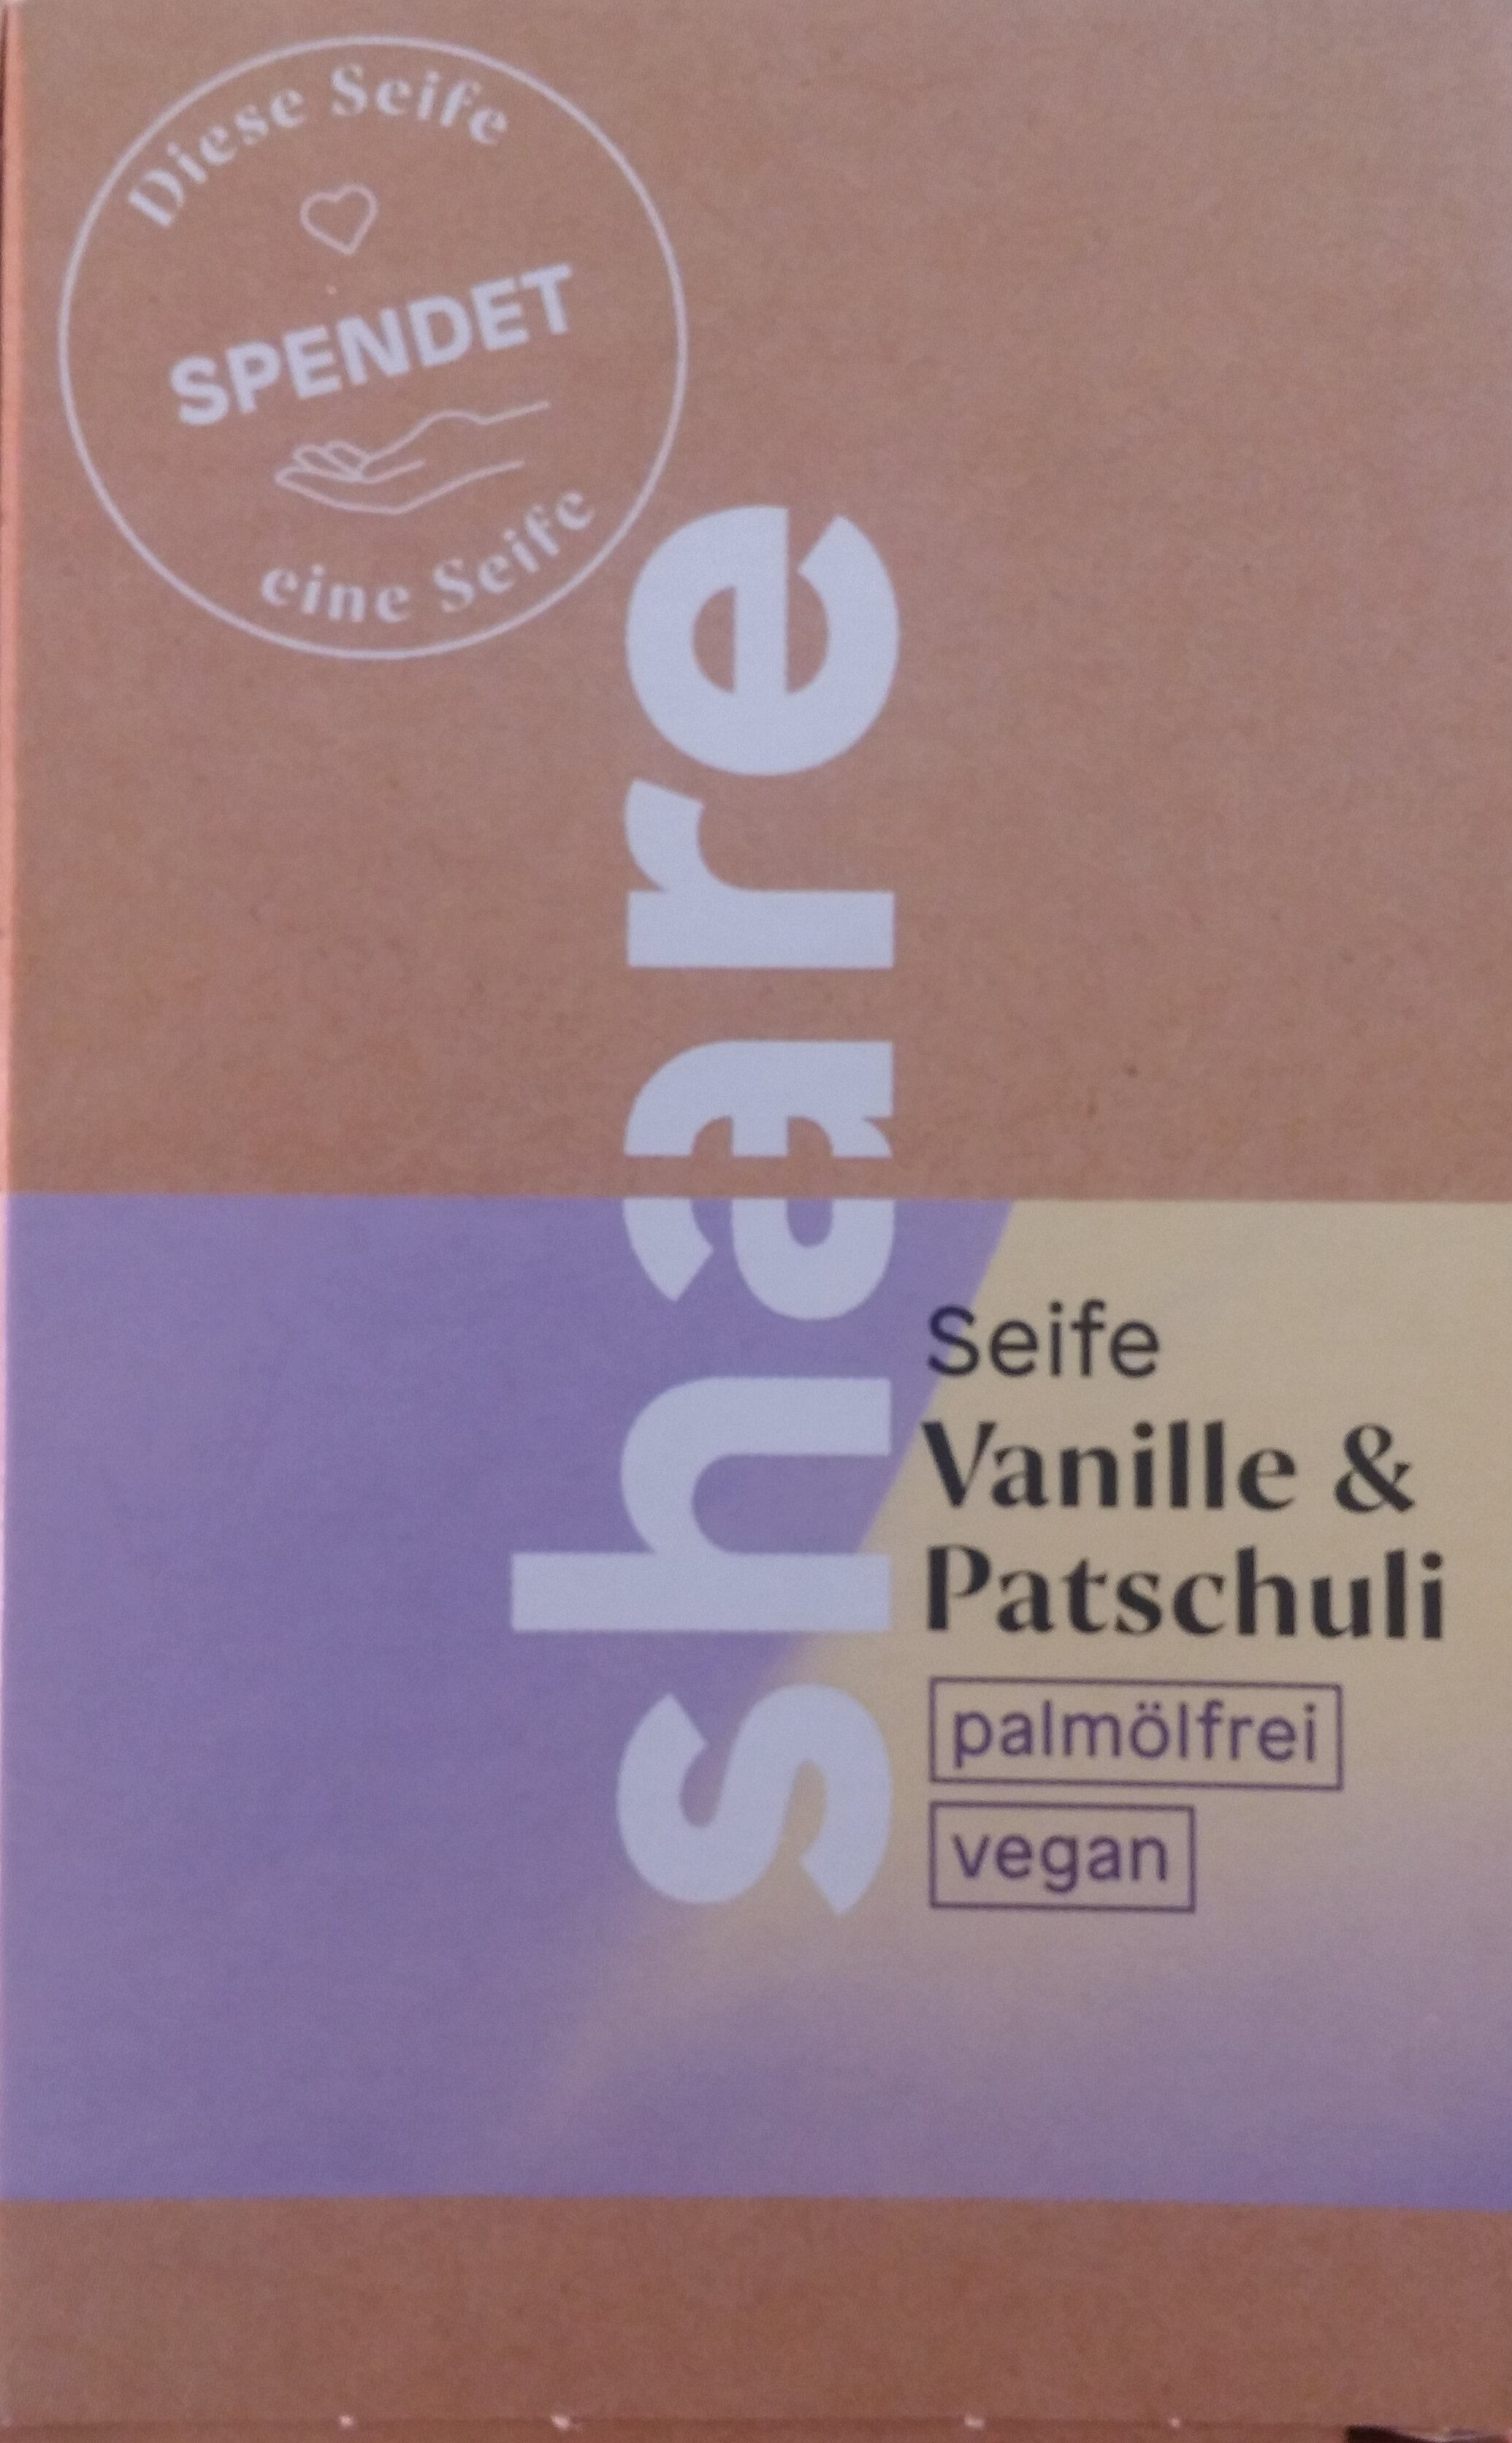 Seife Vanille & Patschuli - Product - de